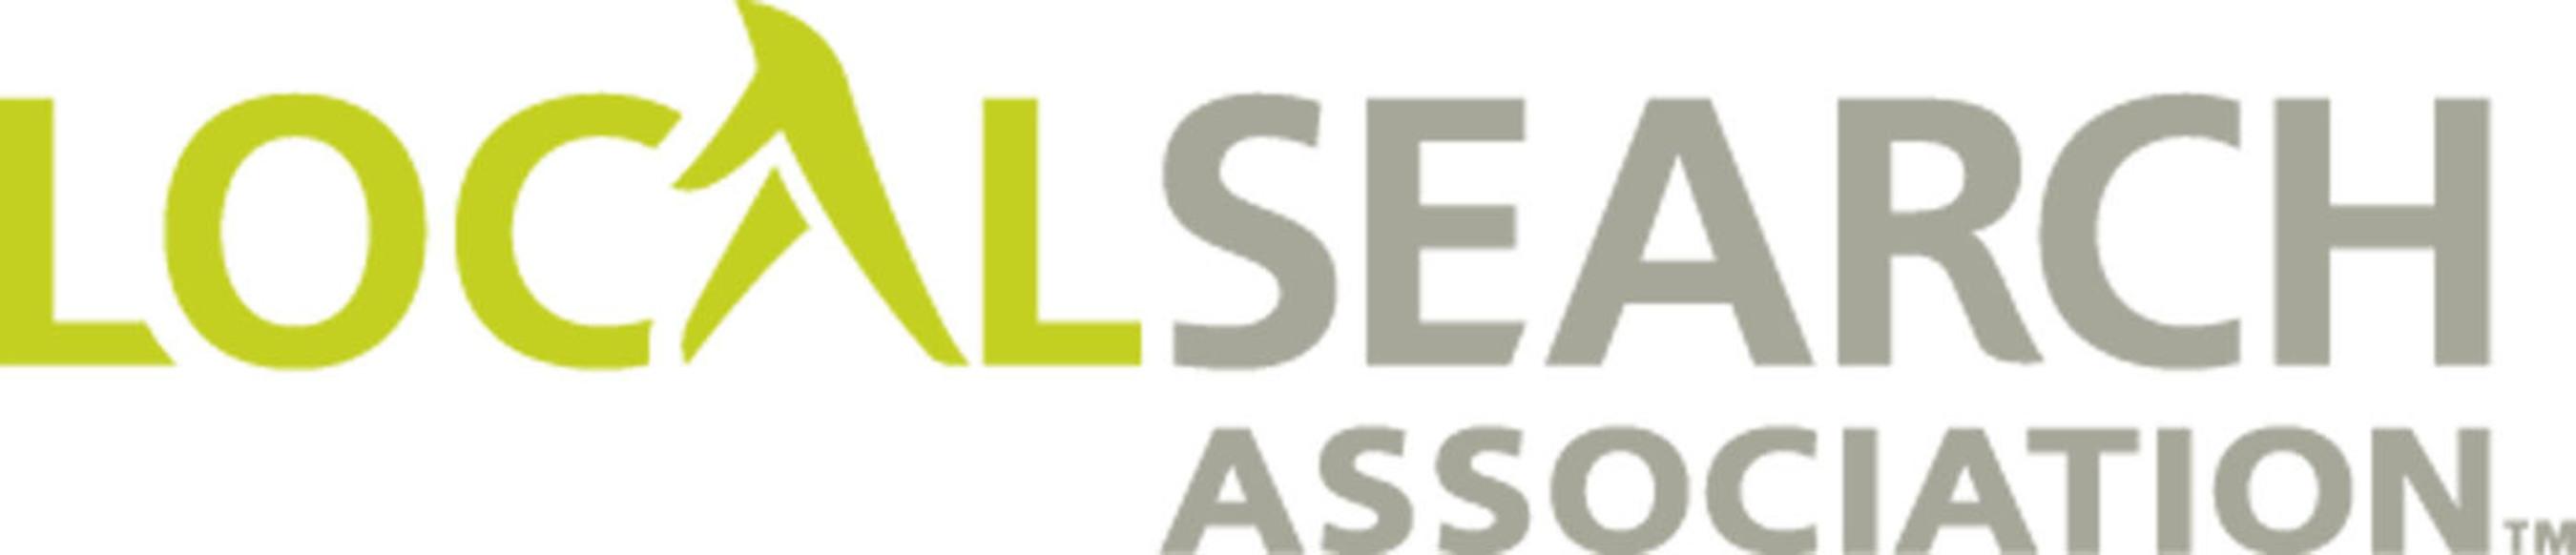 Local Search Association logo.